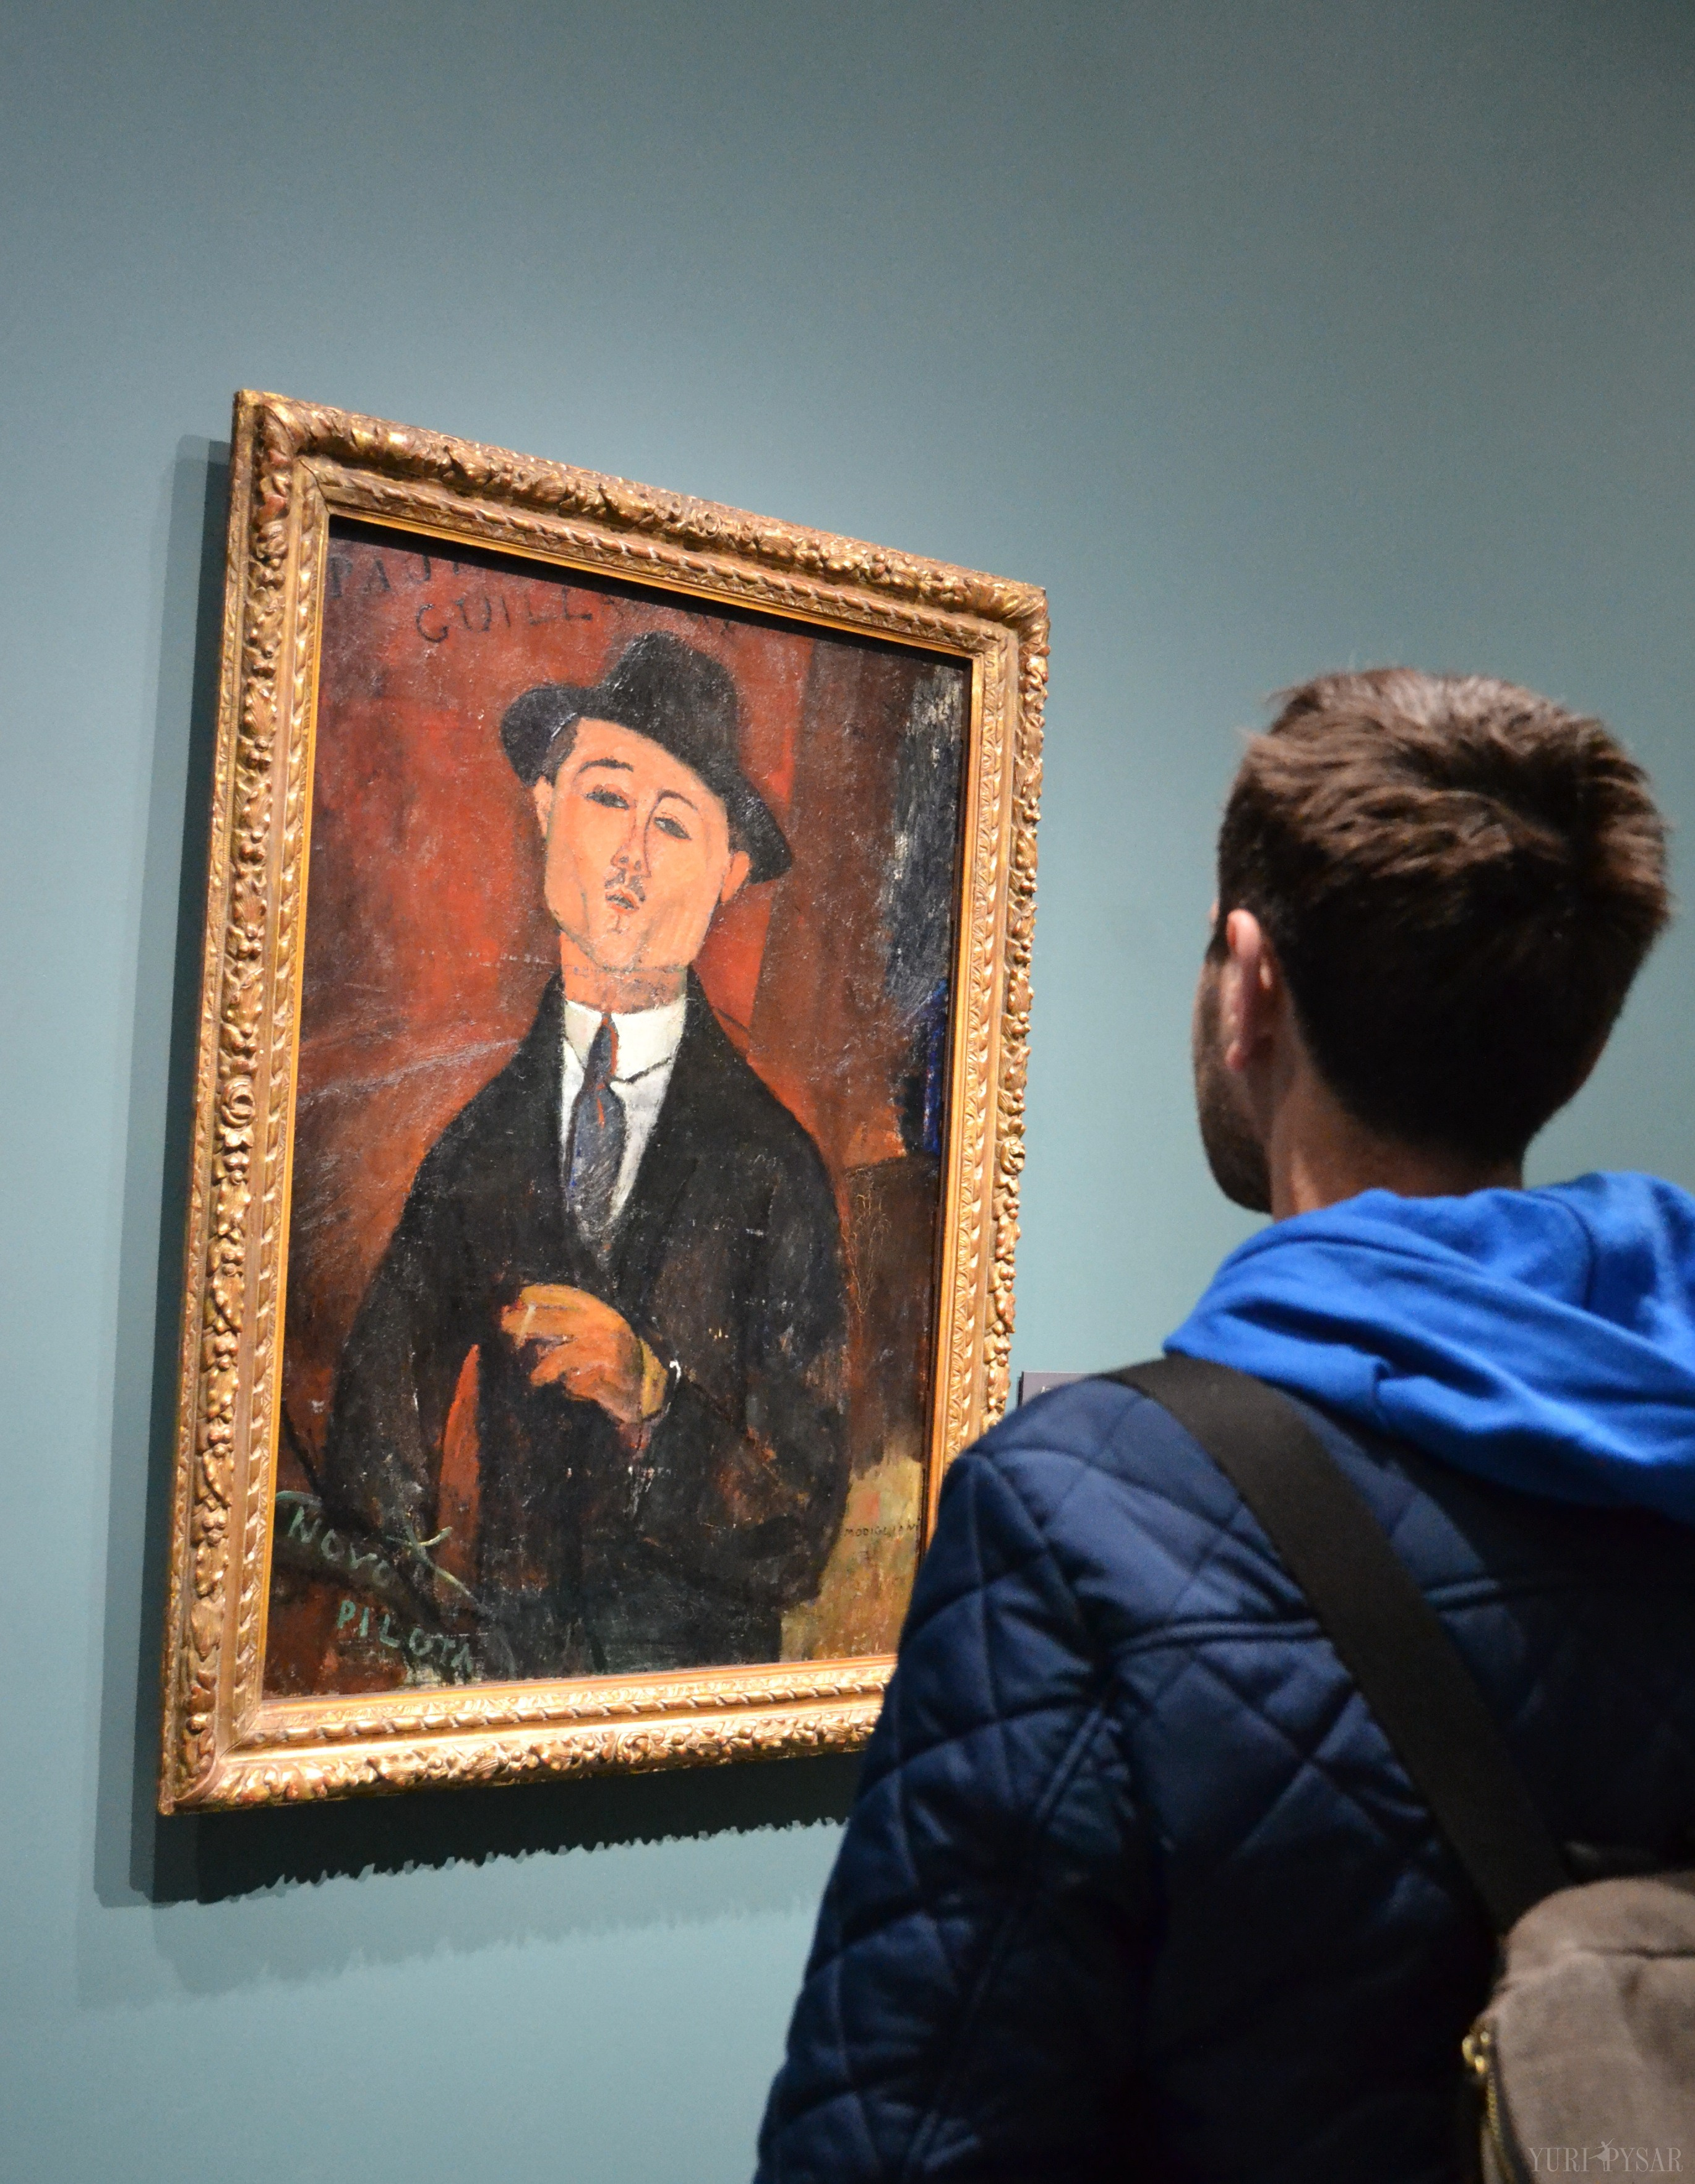 amedeo modigliani's portrait of his friend Paul Guillaume